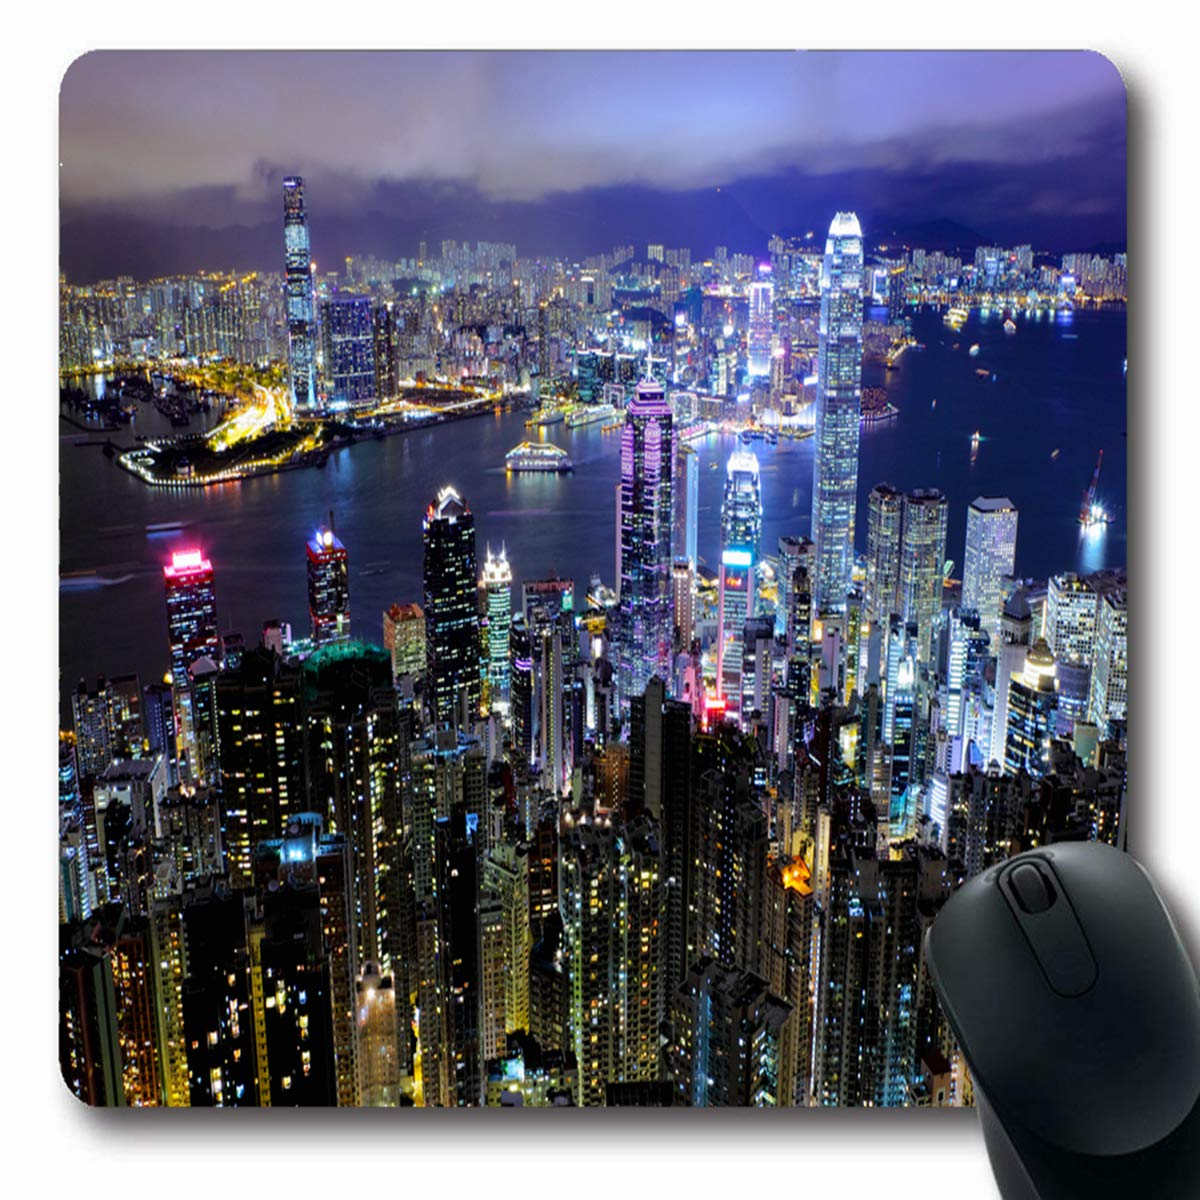 Tobesonne マウスパッド トールスカイライン 香港の夜 経済的 香港市デザイン ダウンタウン 長方形 7.9 x 9.5インチ 滑り止め ゲーム用マウスパッド ゴム 長方形マット 7.9